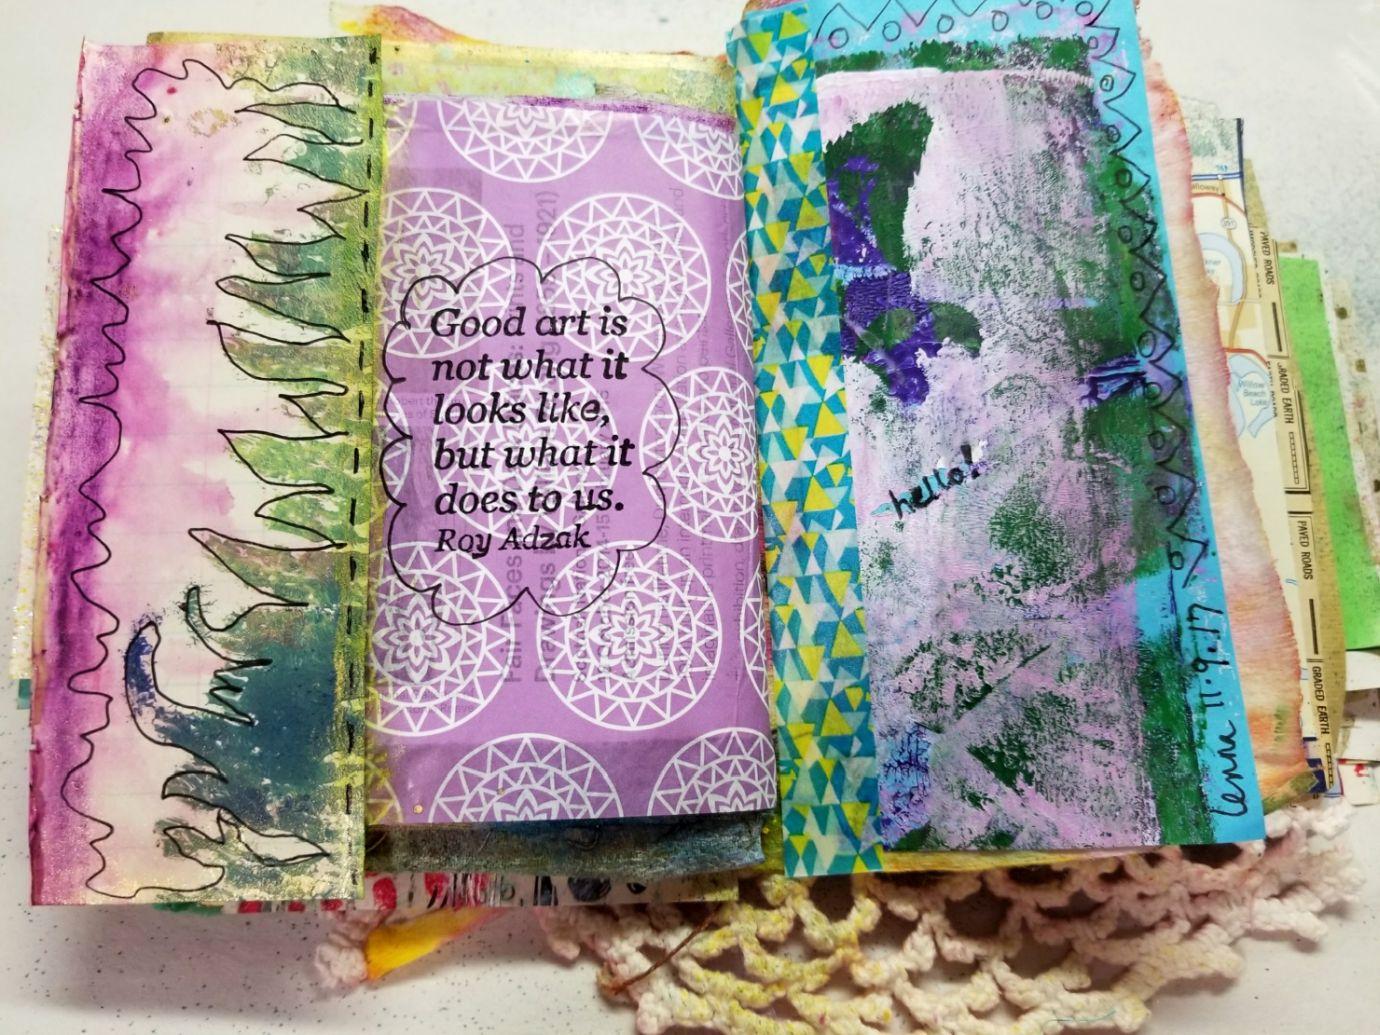 scraps of nature prints & a tissue paper